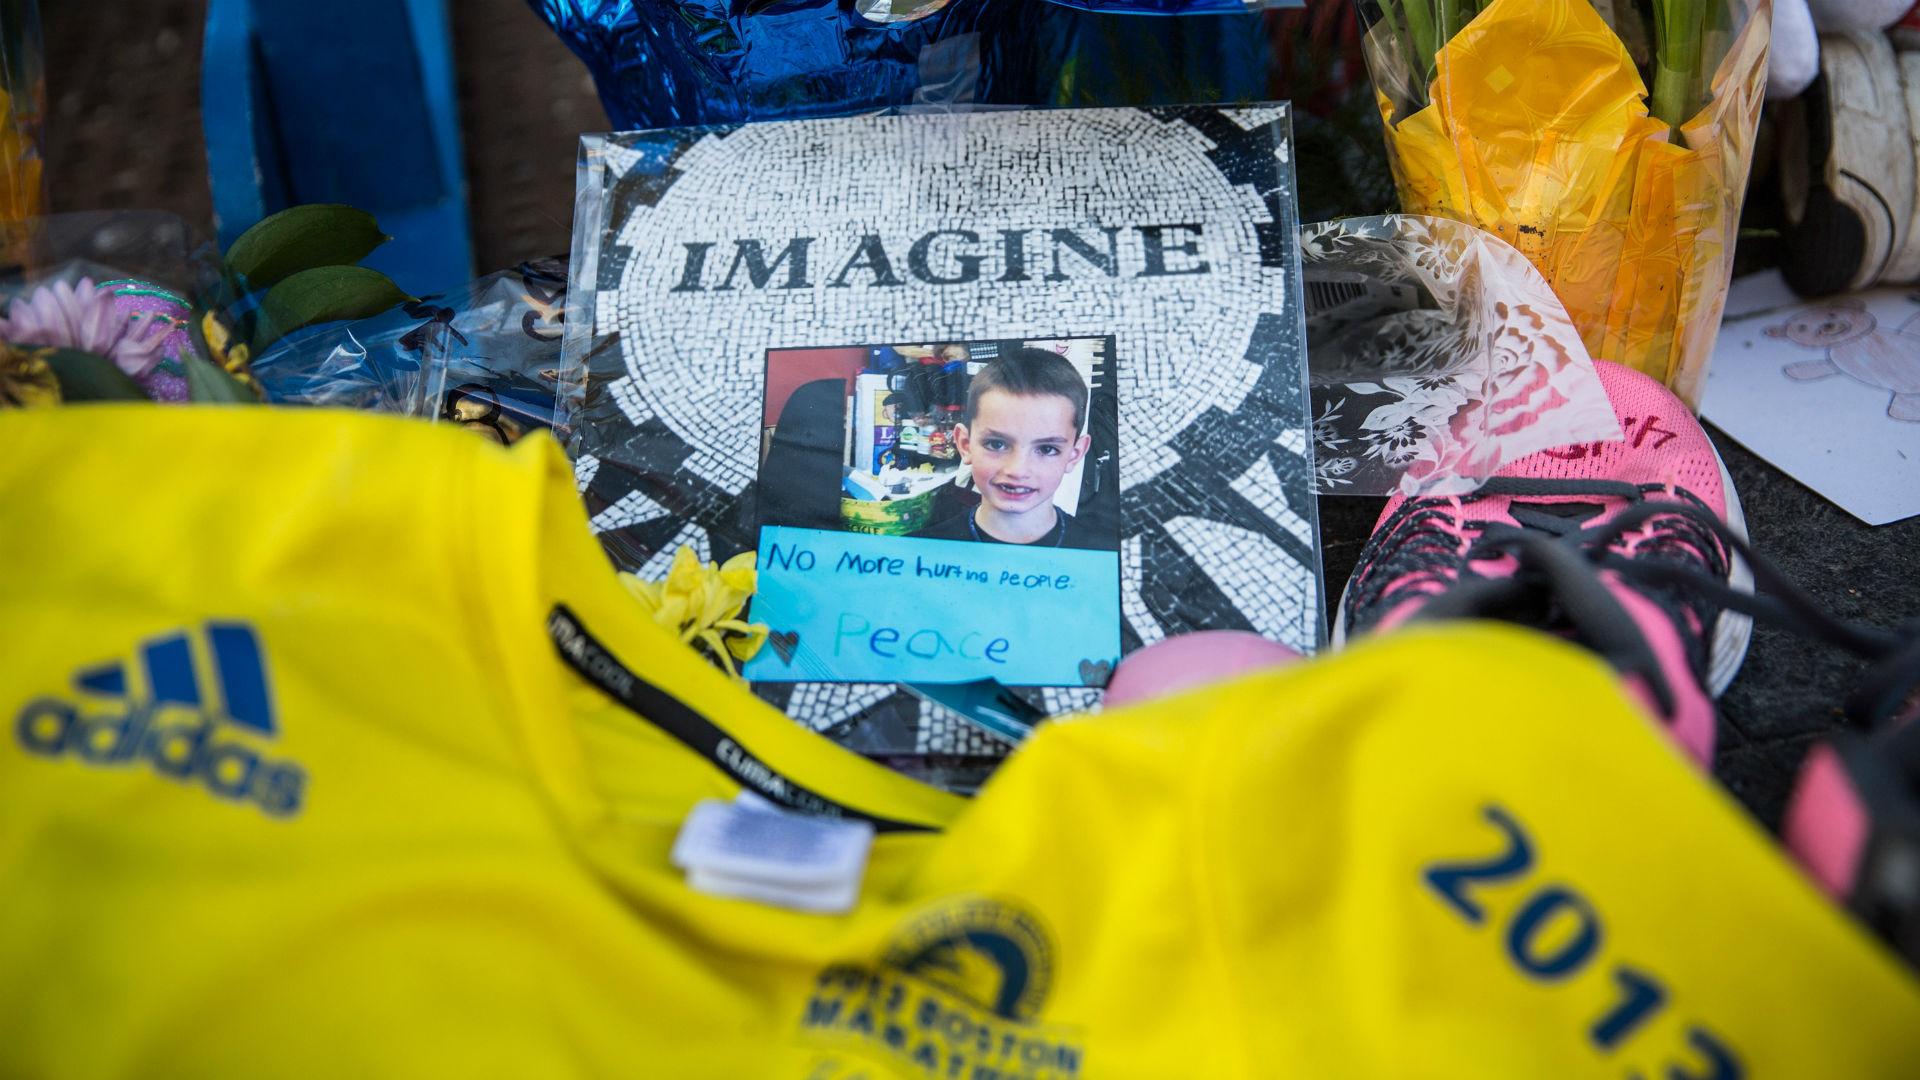 Memorial to 8-year-old Martin Richard